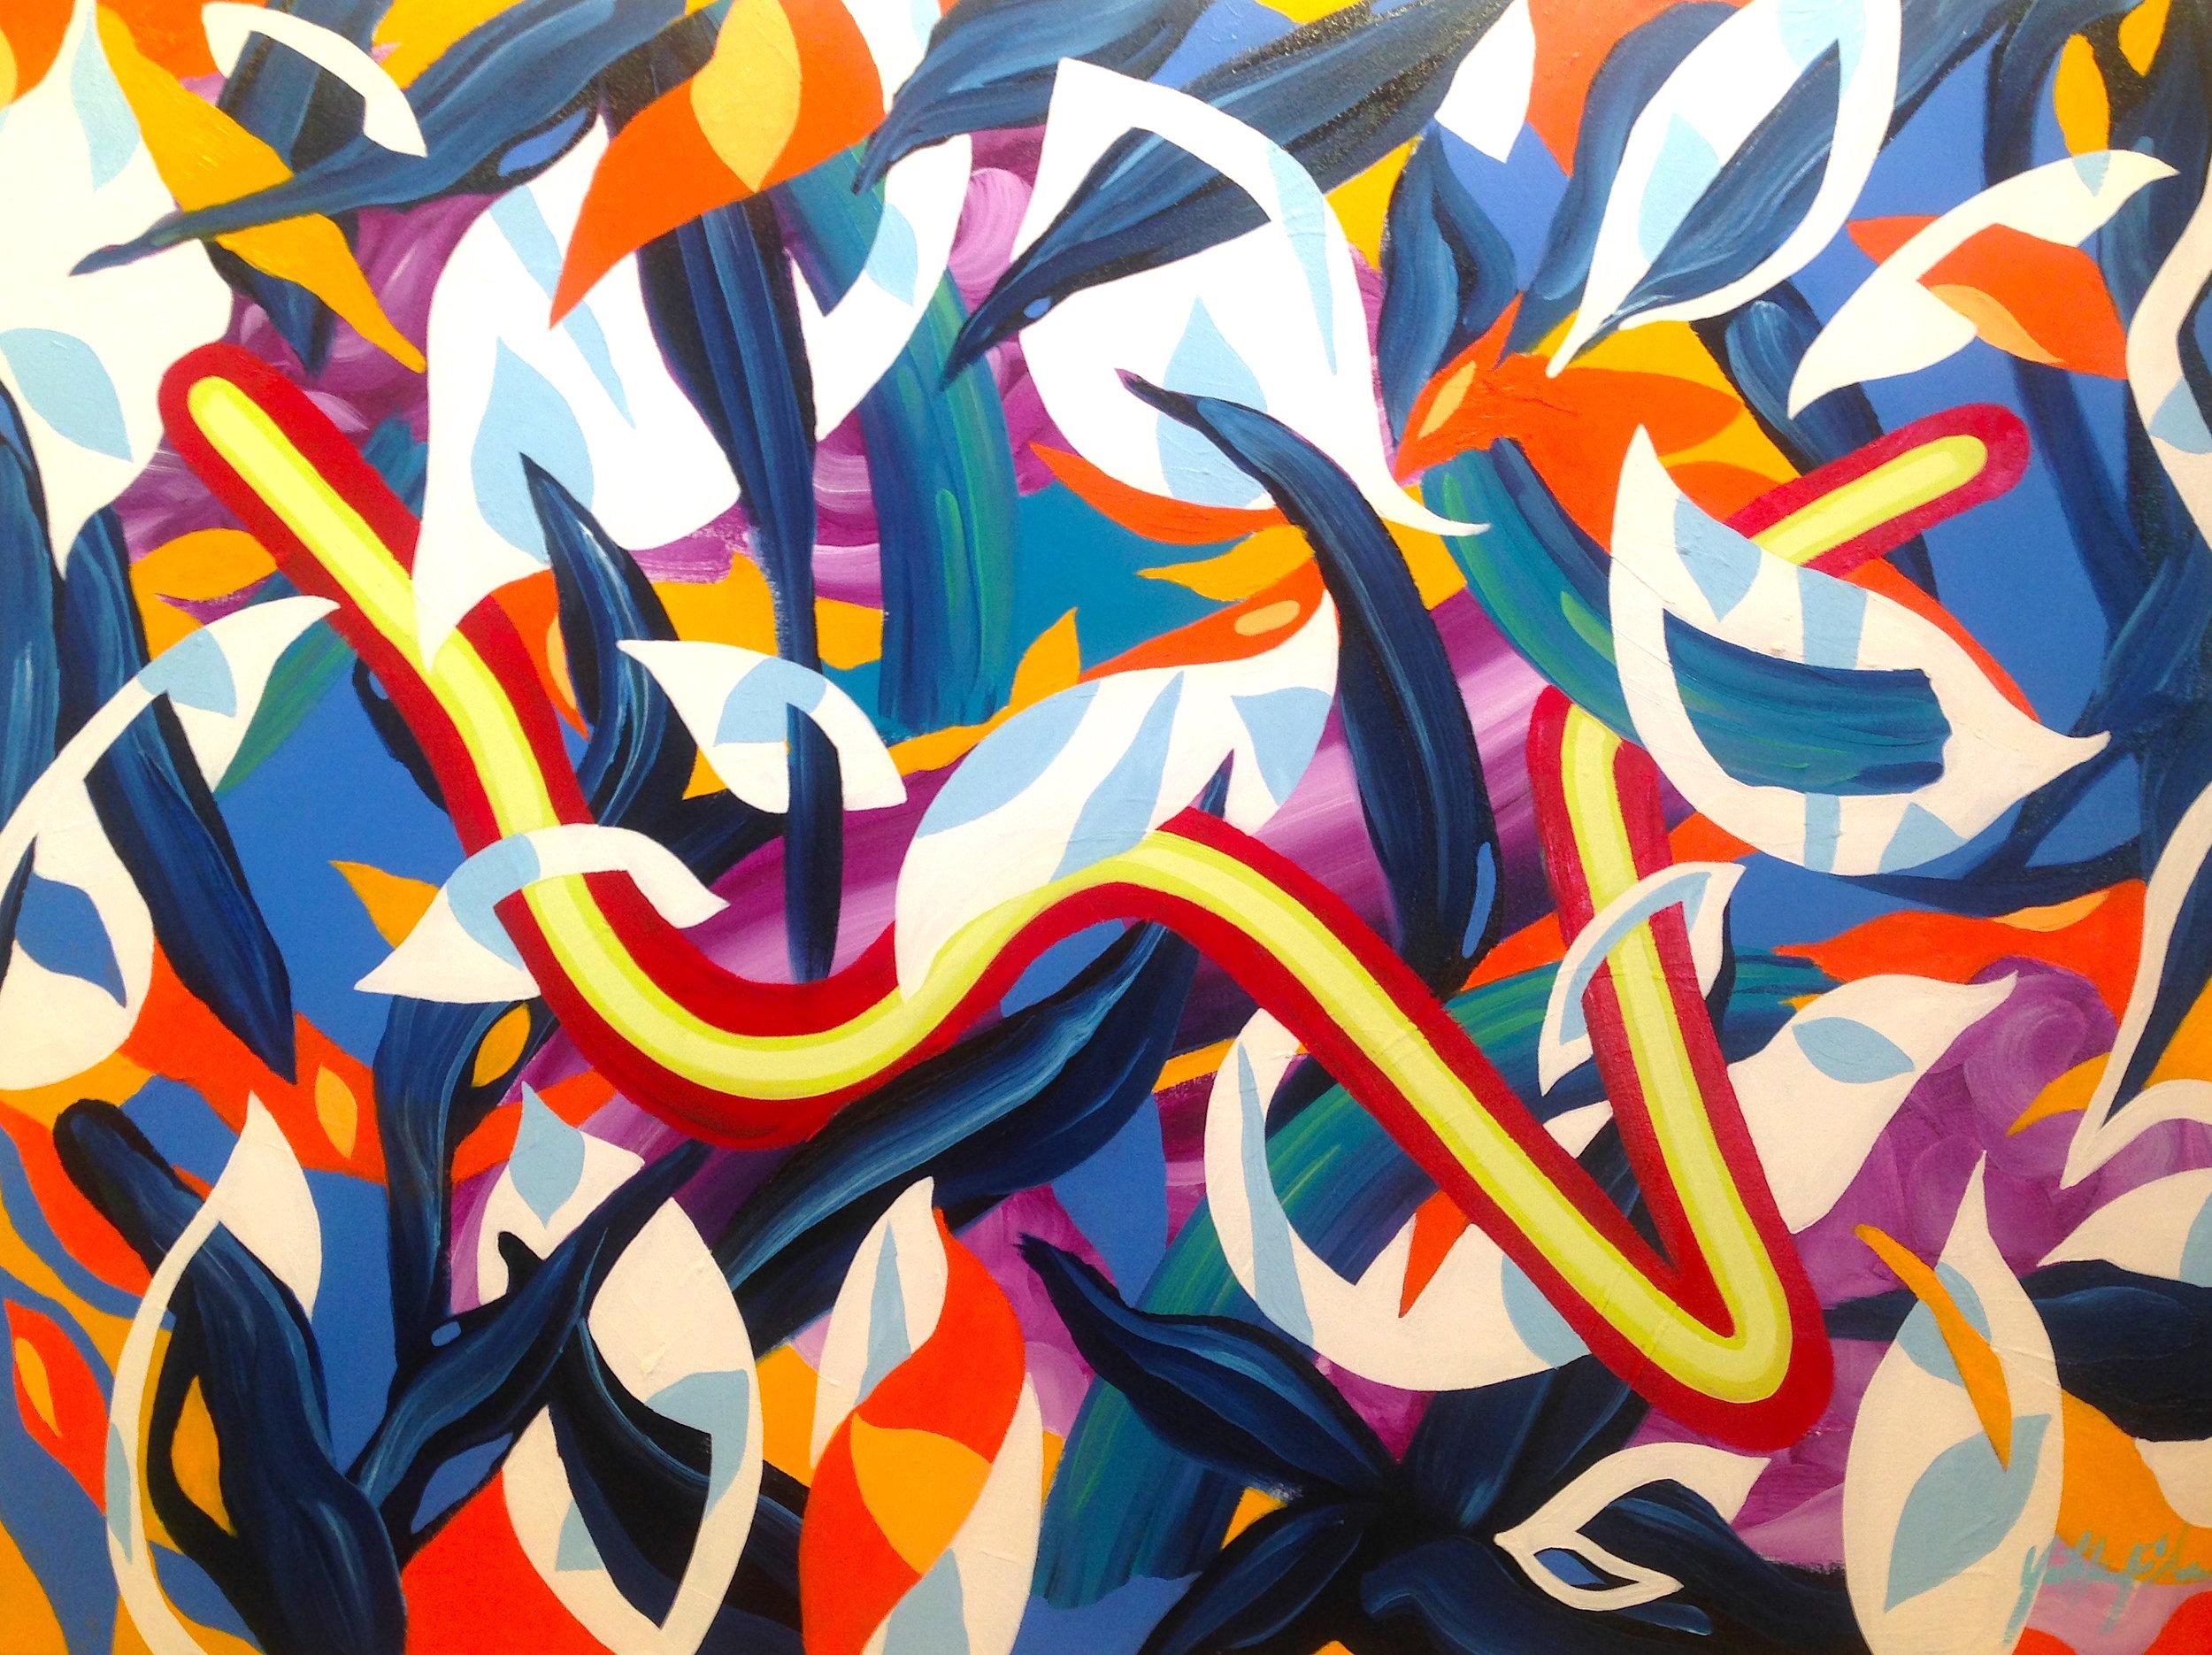 """GardenSnake""   30""x 40"" Oil on Canvas 2015"